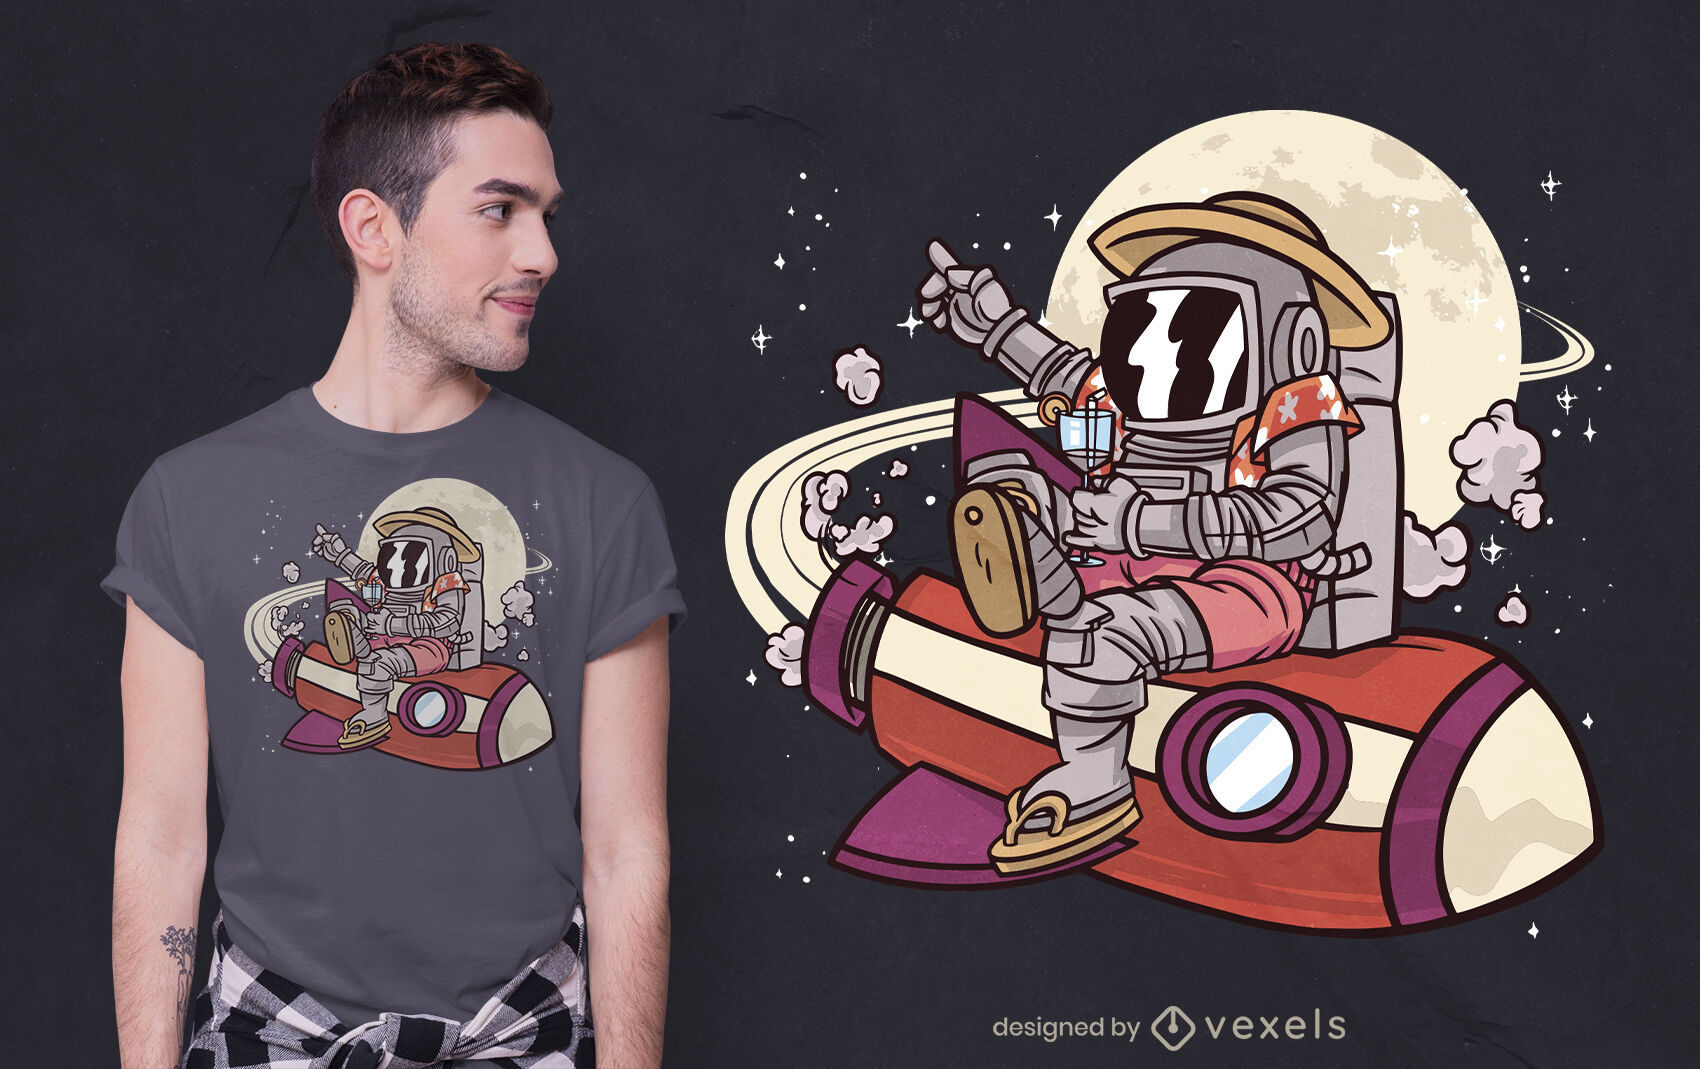 Dise?o de camiseta de ilustraci?n de turista espacial.